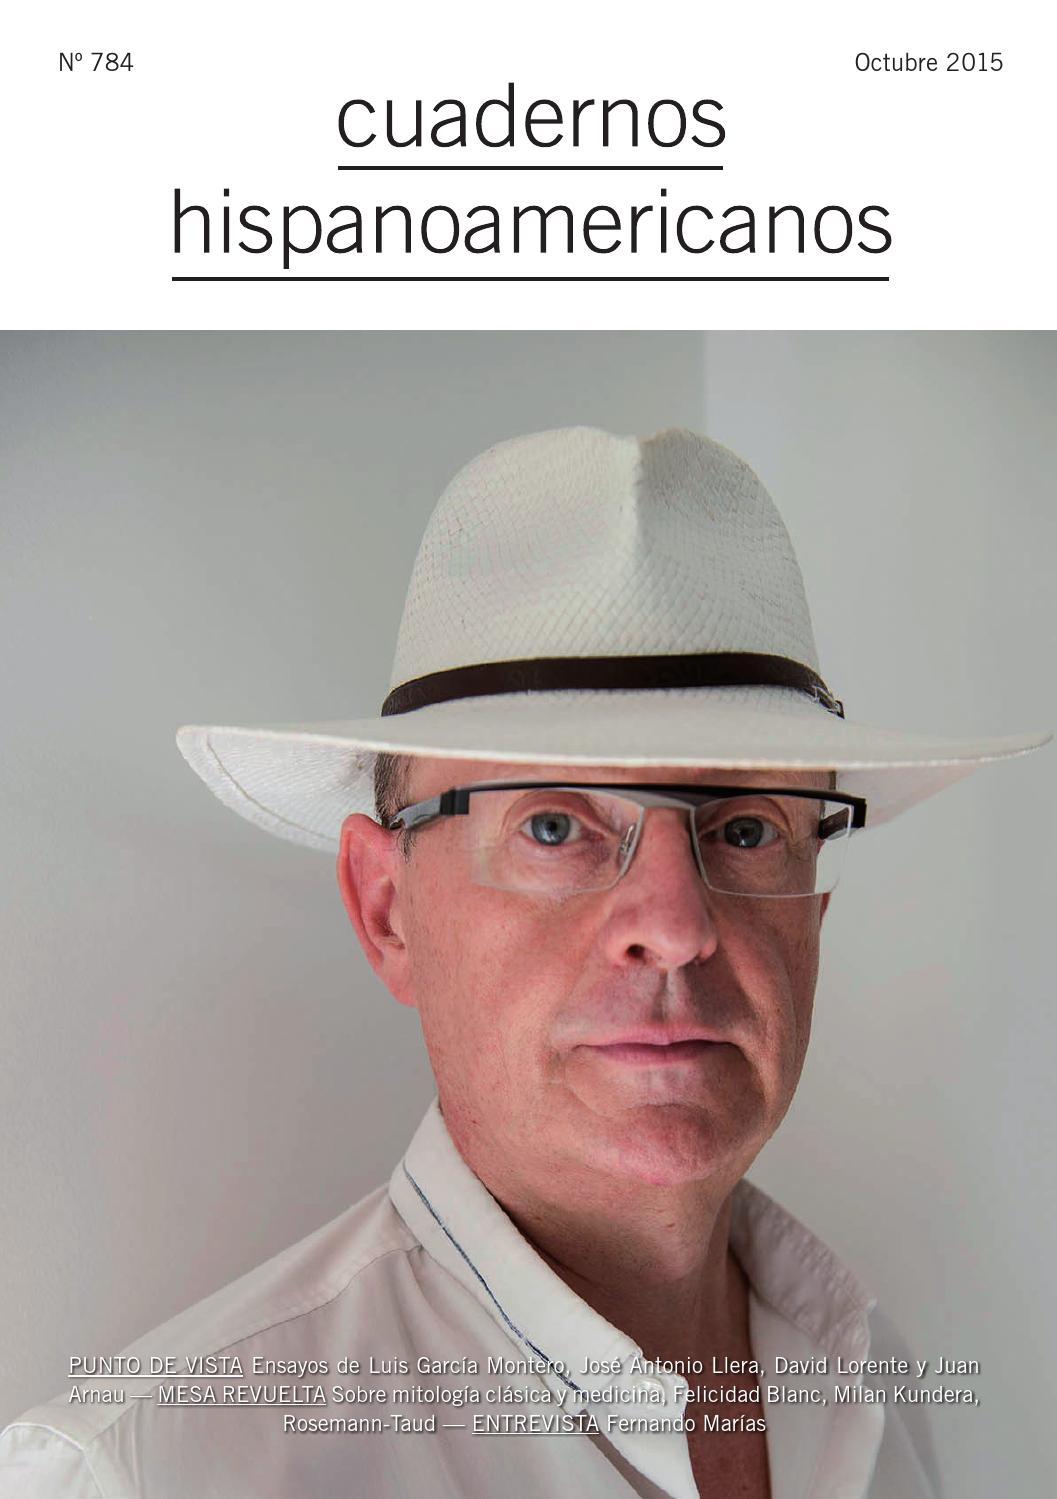 Cuadernos Hispanoamericanos 784 (Octubre 2015) by AECID PUBLICACIONES -  issuu e70d05eff6d